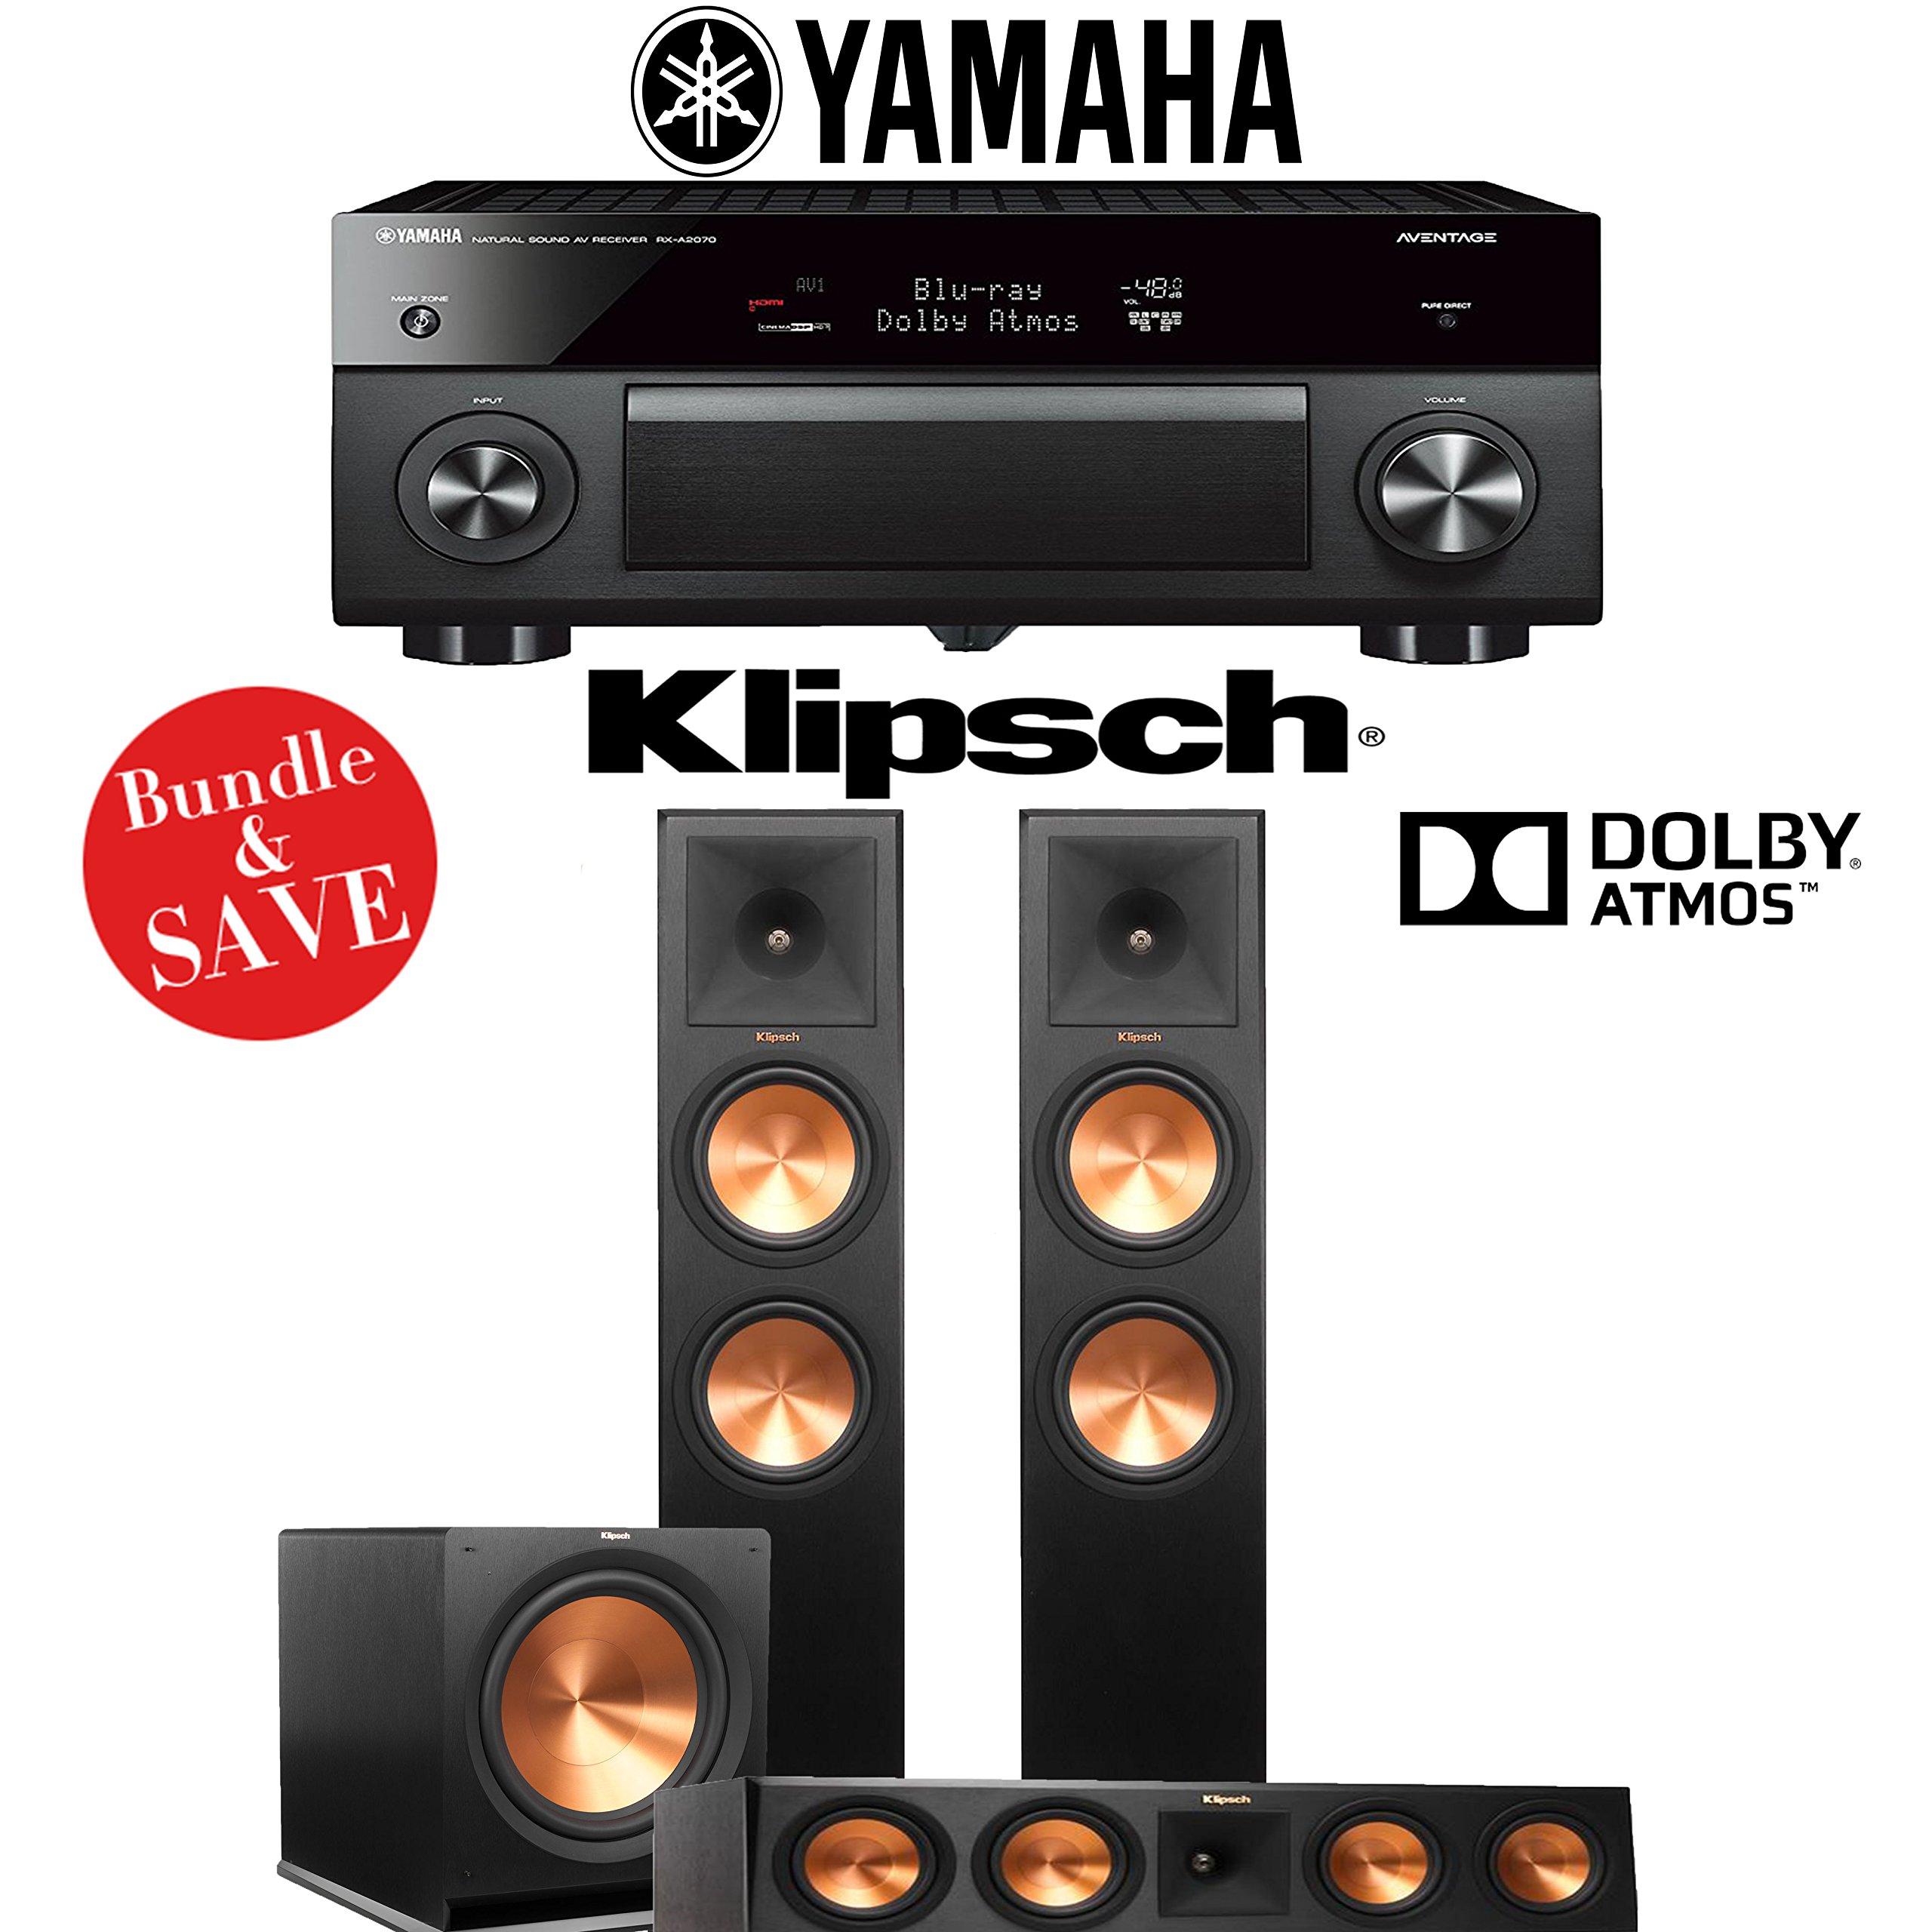 Yamaha AVENTAGE RX-A2070BL 9.2-Ch 4K Network AV Receiver + Klipsch RP-280FA + Klipsch RP-450C + Klipsch R-115SW - 3.1-Ch Dolby Atmos Home Theater Package